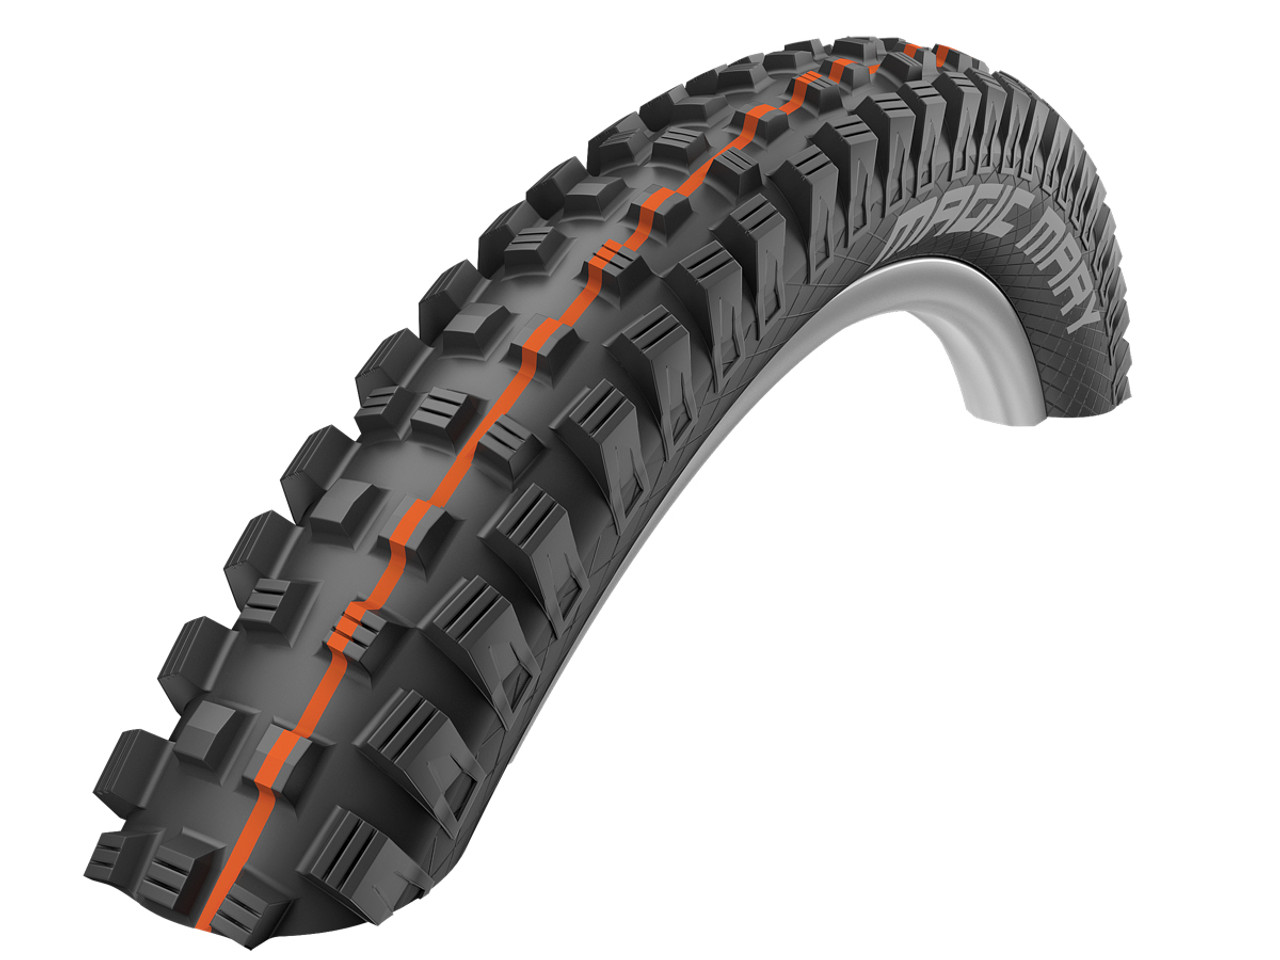 Schwalbe Addix Magic Mary Evo Soft Super Gravity TL-Easy Folding Tyre 26 x 2.35